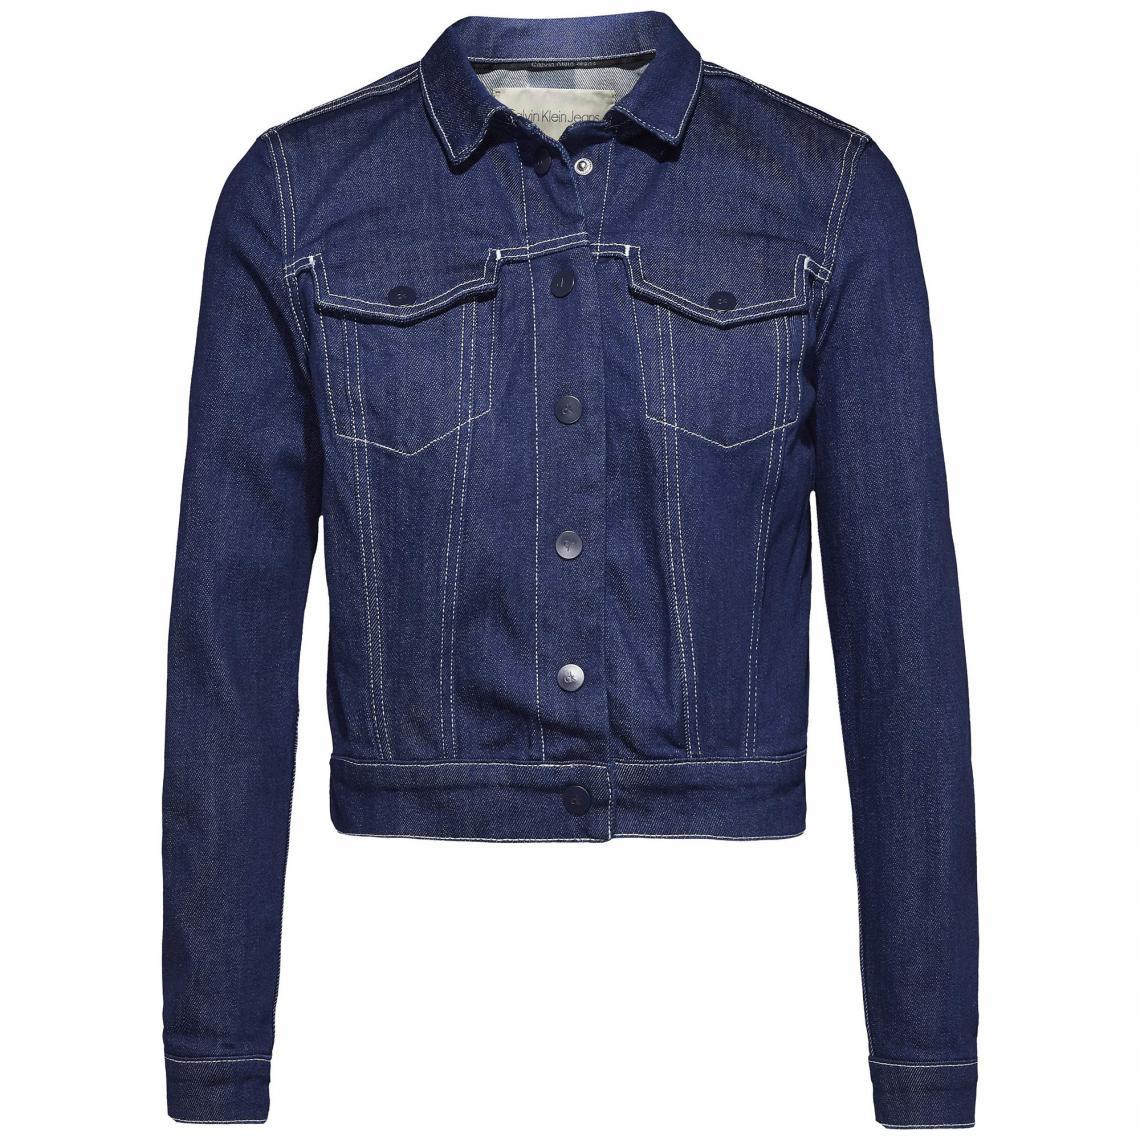 Veste en jean femme Reblc Calvin Klein - brut vintage Calvin Klein Jeans 6ec584e87909